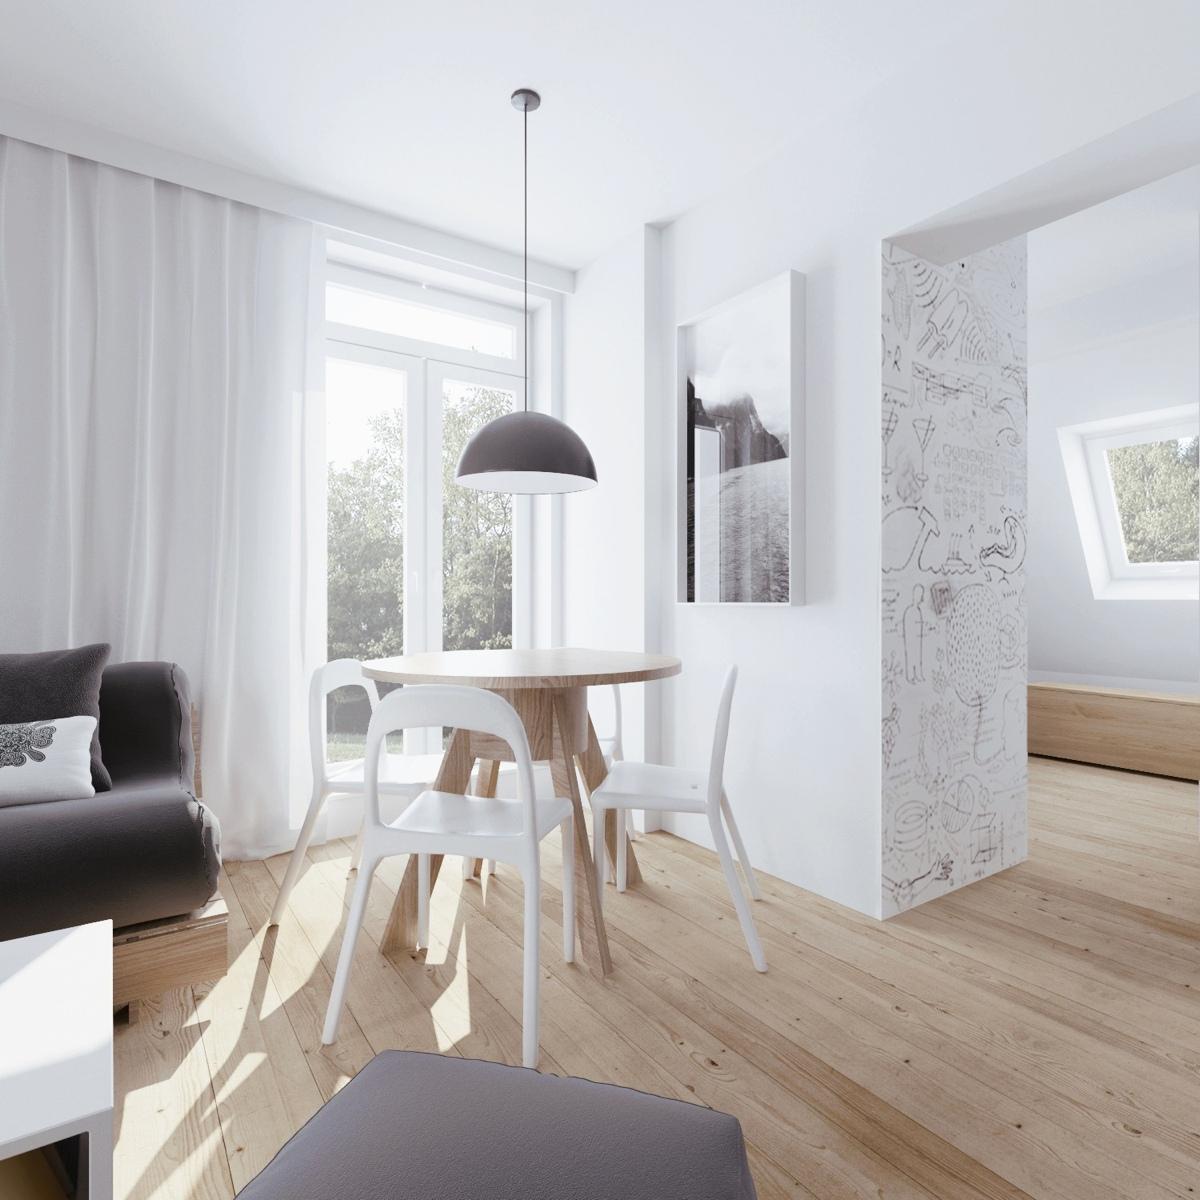 Minimalist apartment design with soft color scheme for Minimalist apartment ideas